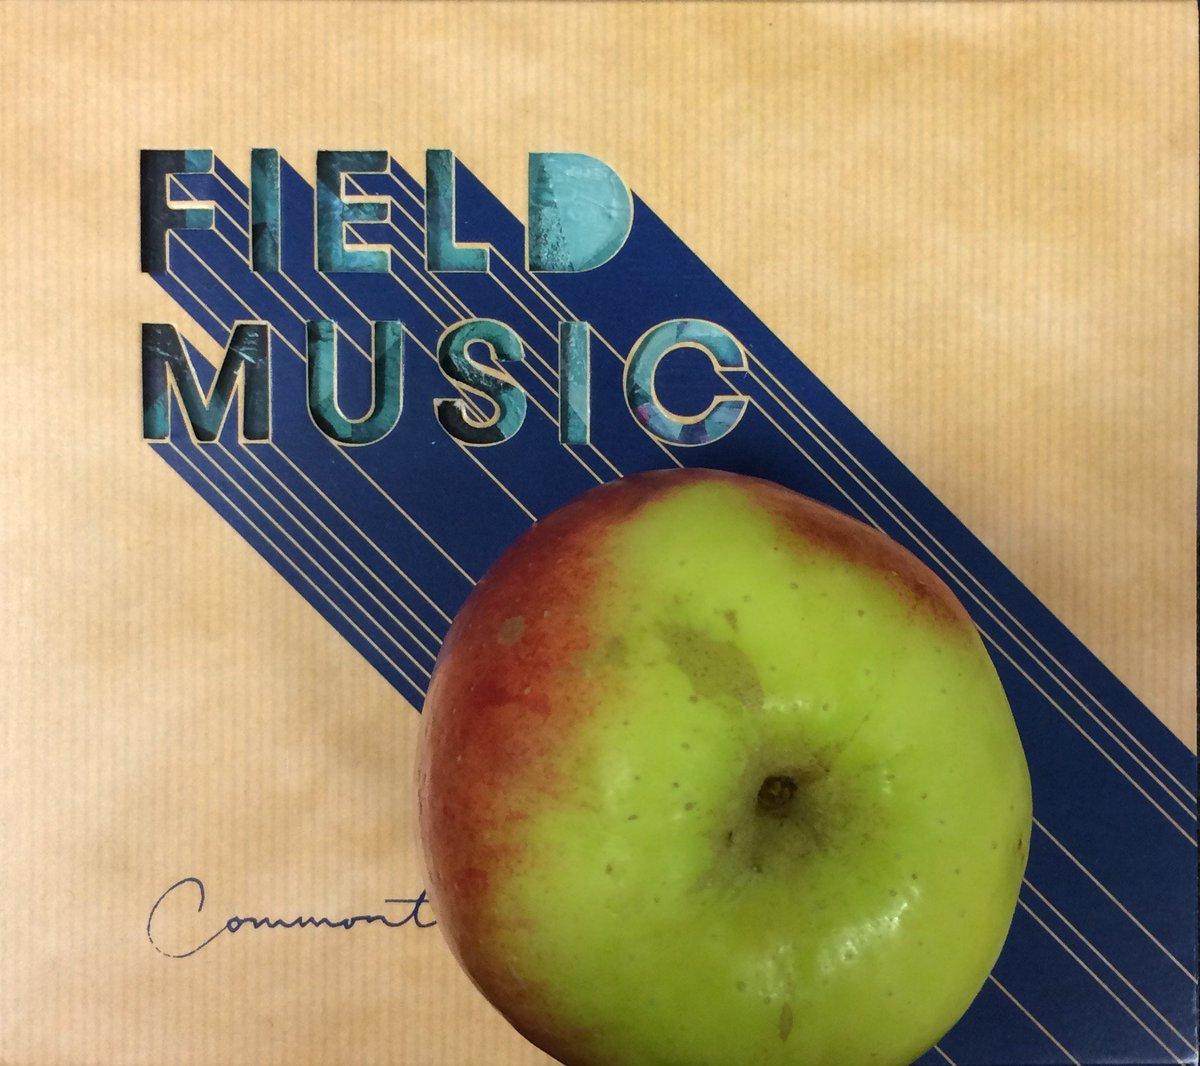 And so to new things. @fieldmusicmusic + @AppleMusic = @zanelowe #WORLDRECORD tonight on @Beats1 https://t.co/XSiUnVIFye